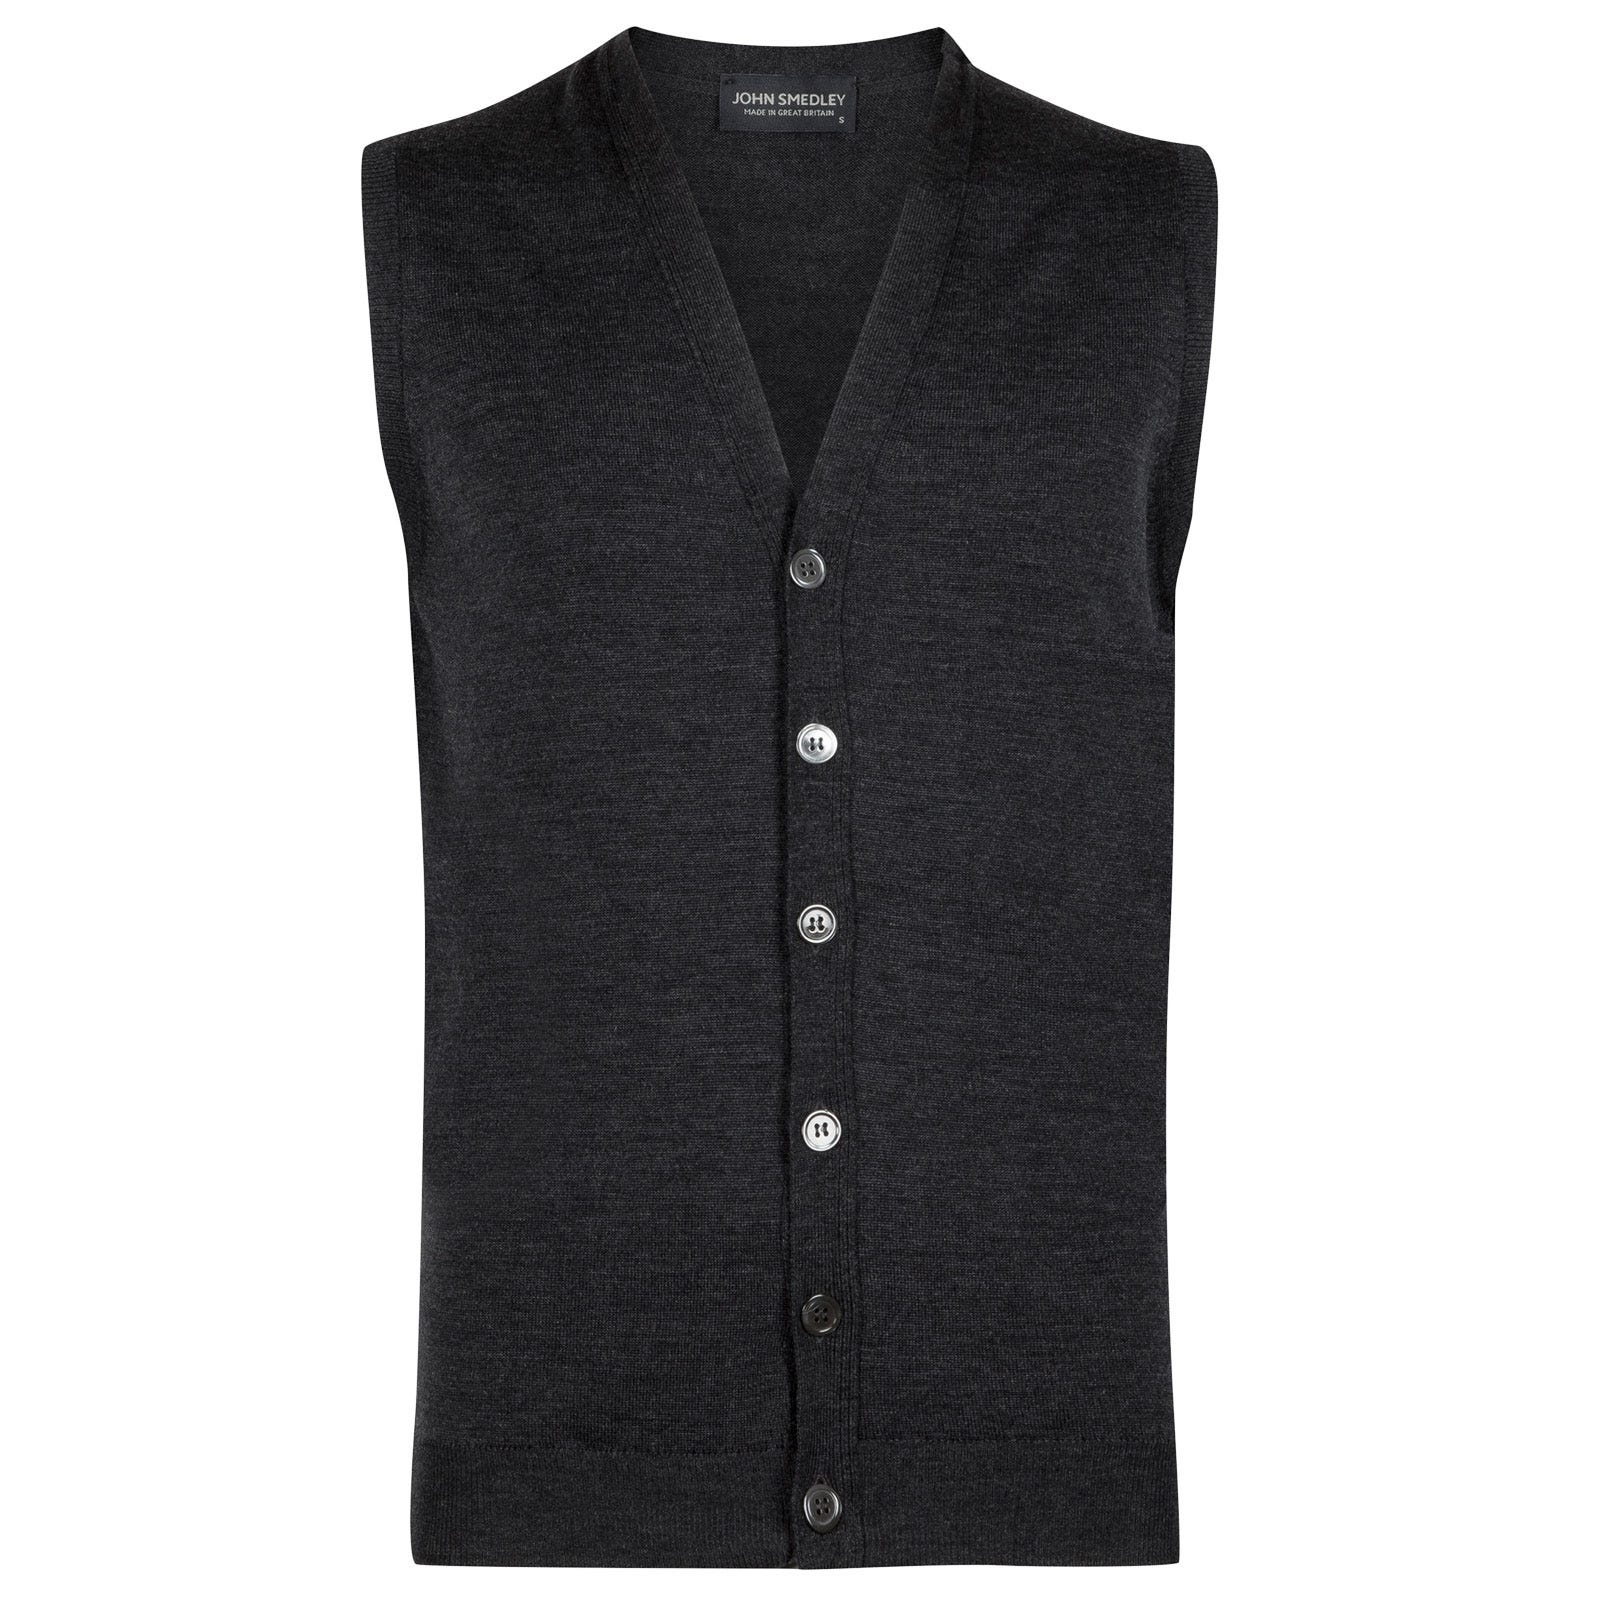 John Smedley stavely Merino Wool Waistcoat in Charcoal-XL